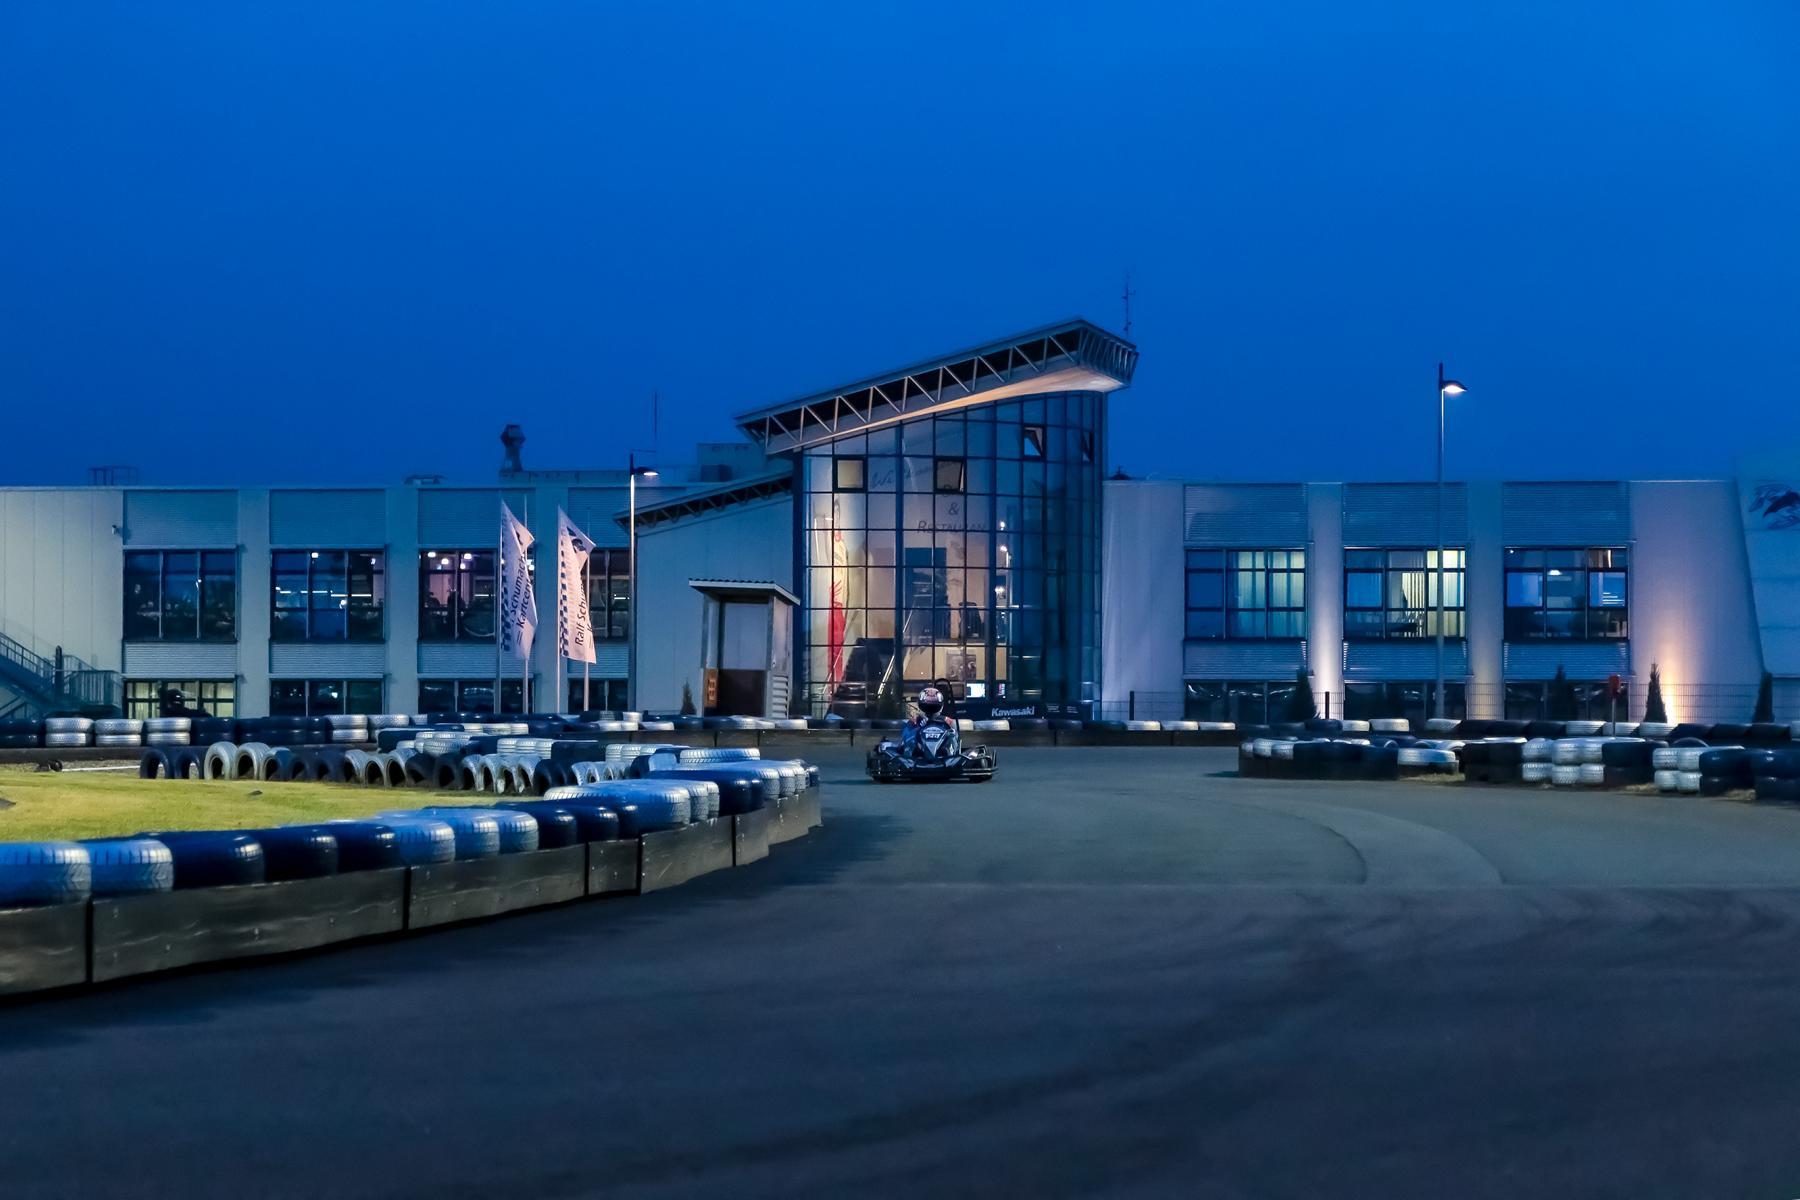 rs-kartcenter-outdoor-flutlicht-min.JPG